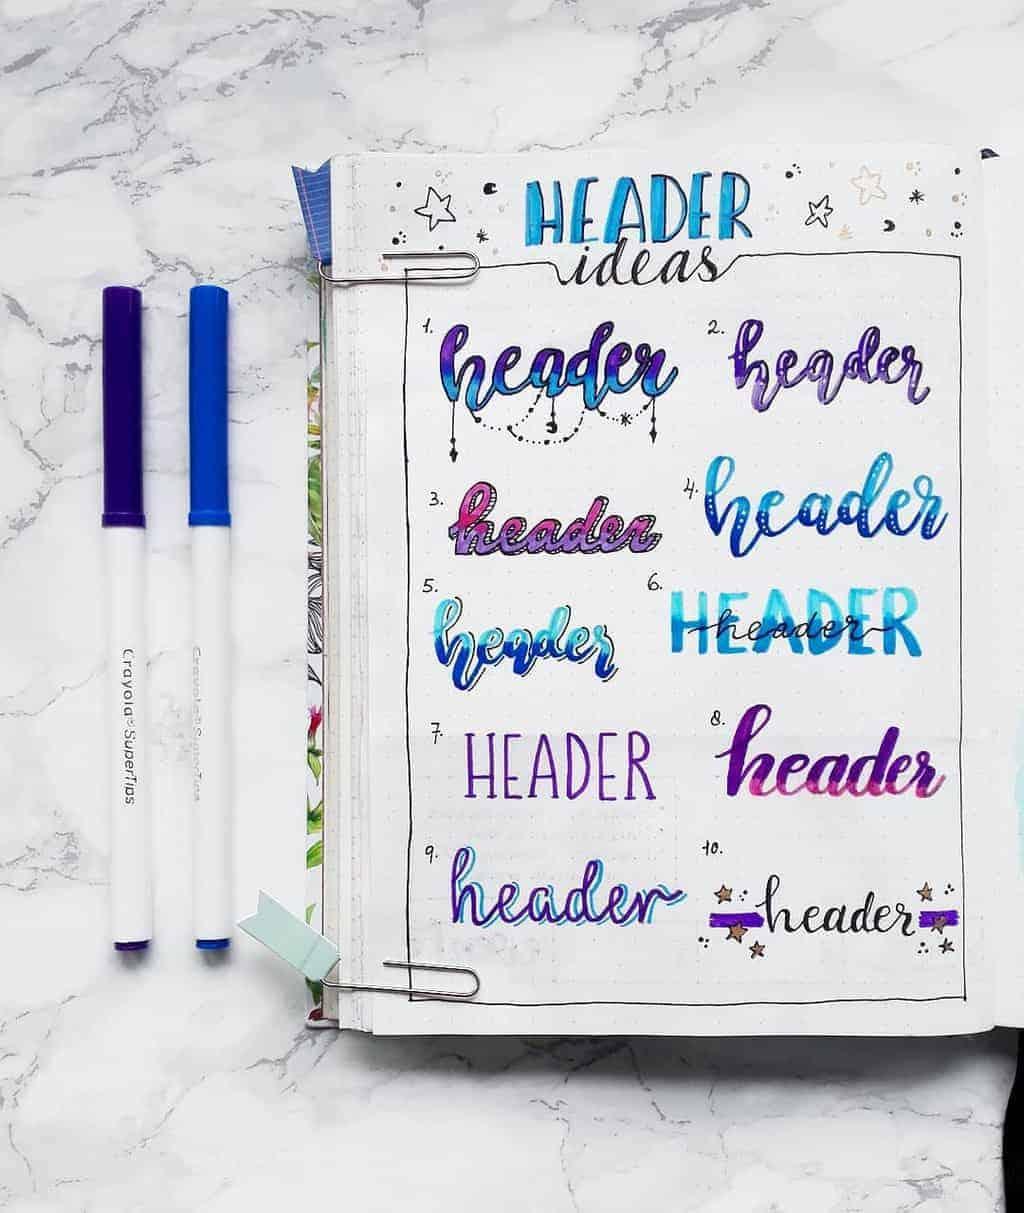 Bullet Journal Headers, ideas by @mathusbujo | Masha Plans